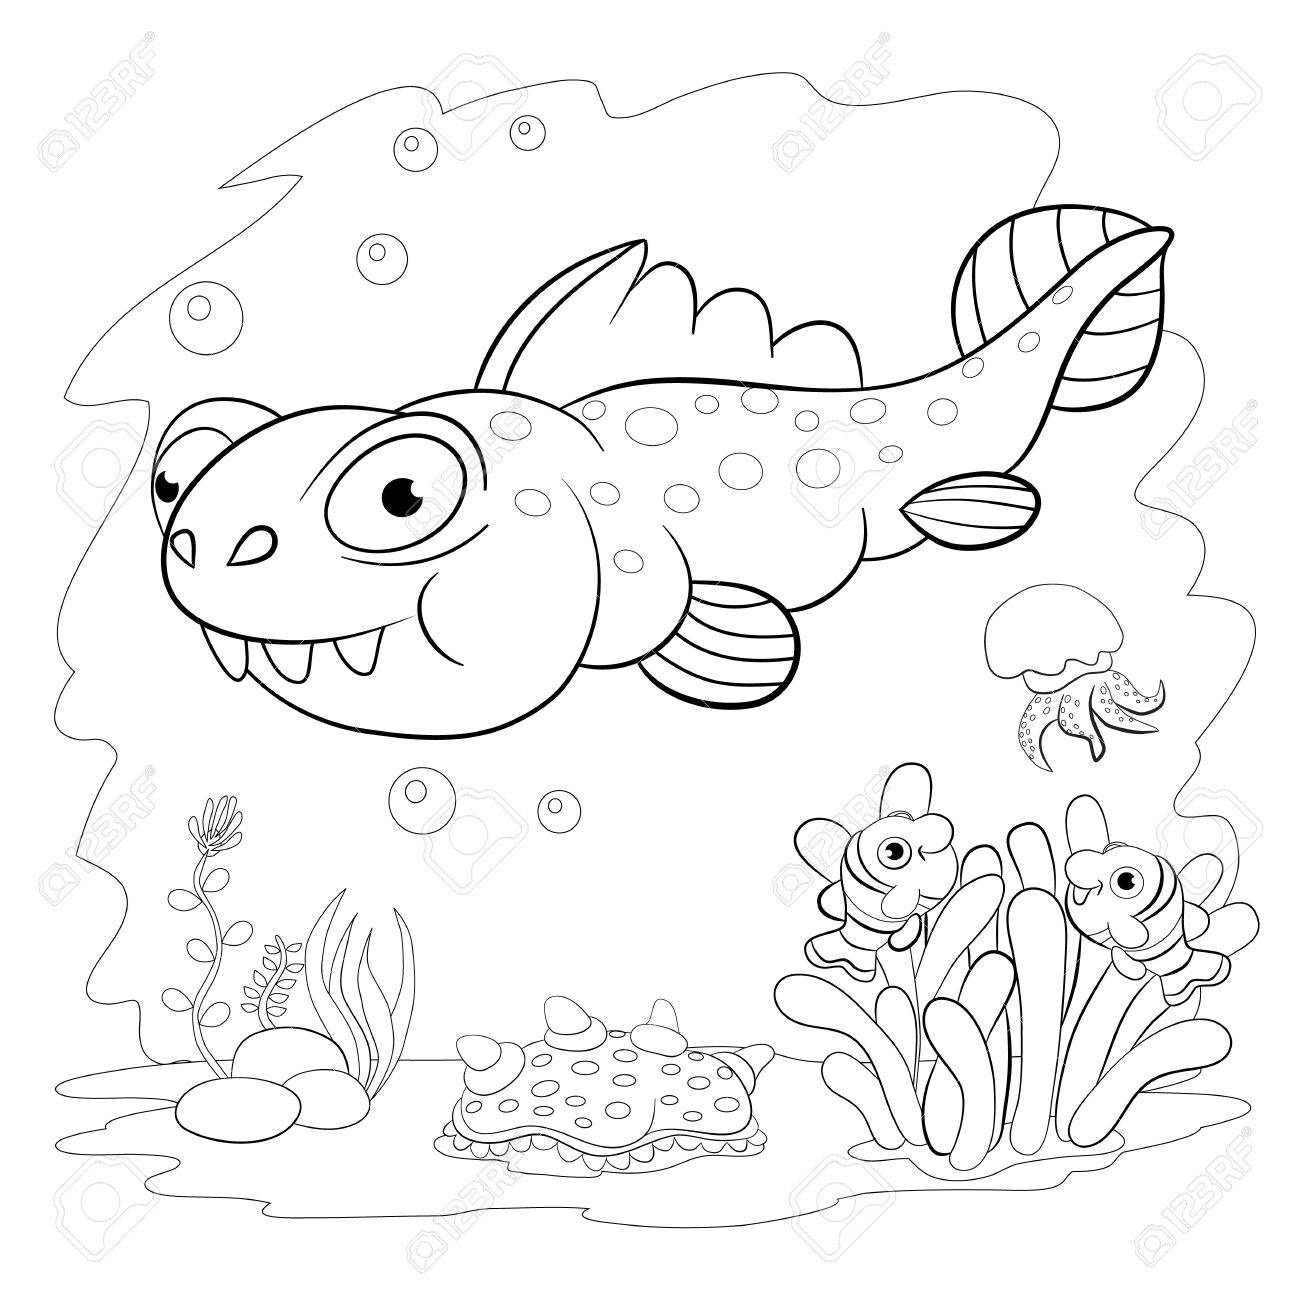 Libro De Colorear. Dinosaurio Divertido En Un Mar. Dibujos Animados ...